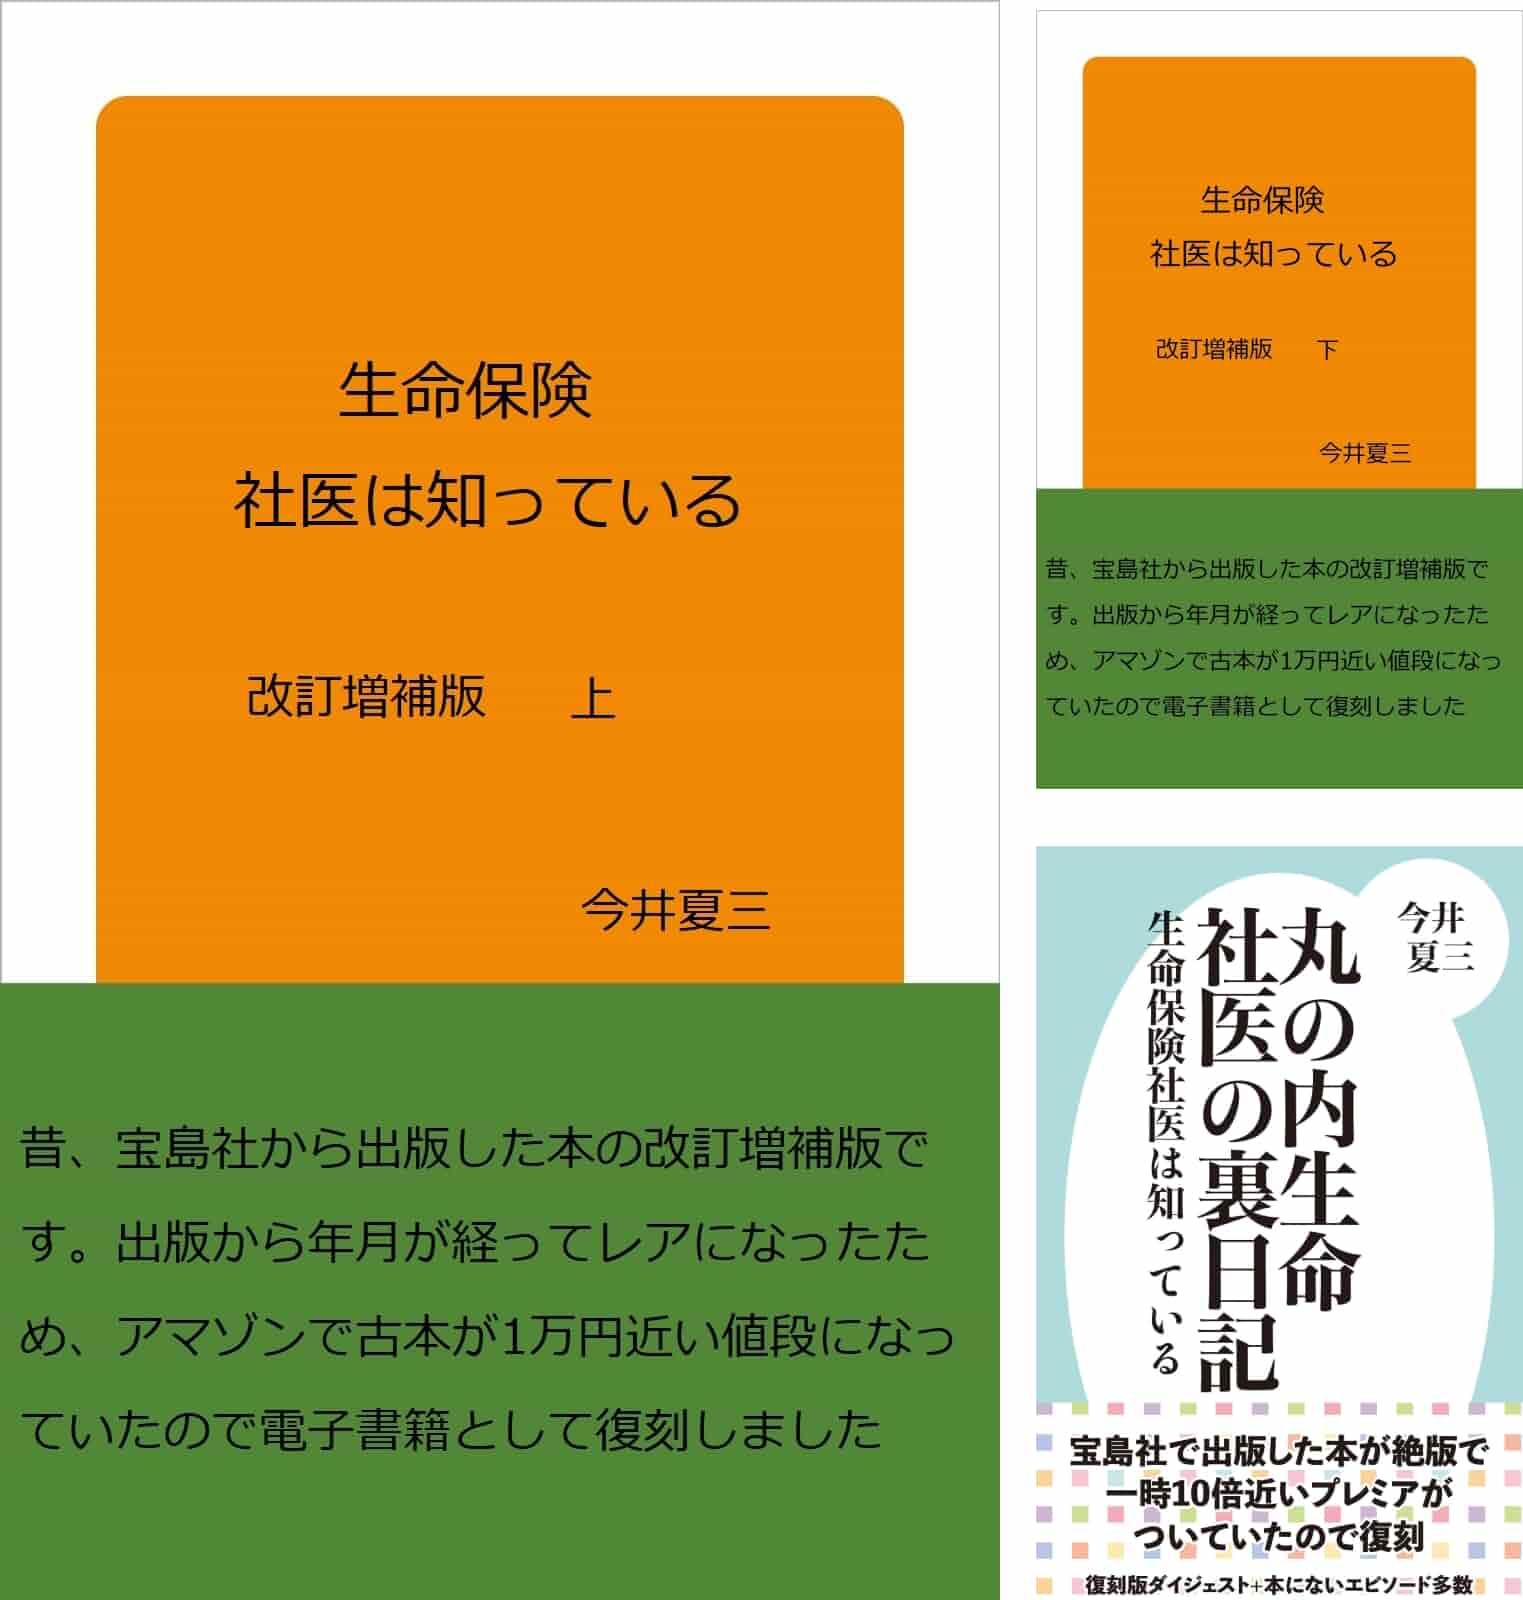 Stedman's English-Japanese Medical Dictionary 5th Edition. (3). [まとめ買い]  生命保険社医は知っている